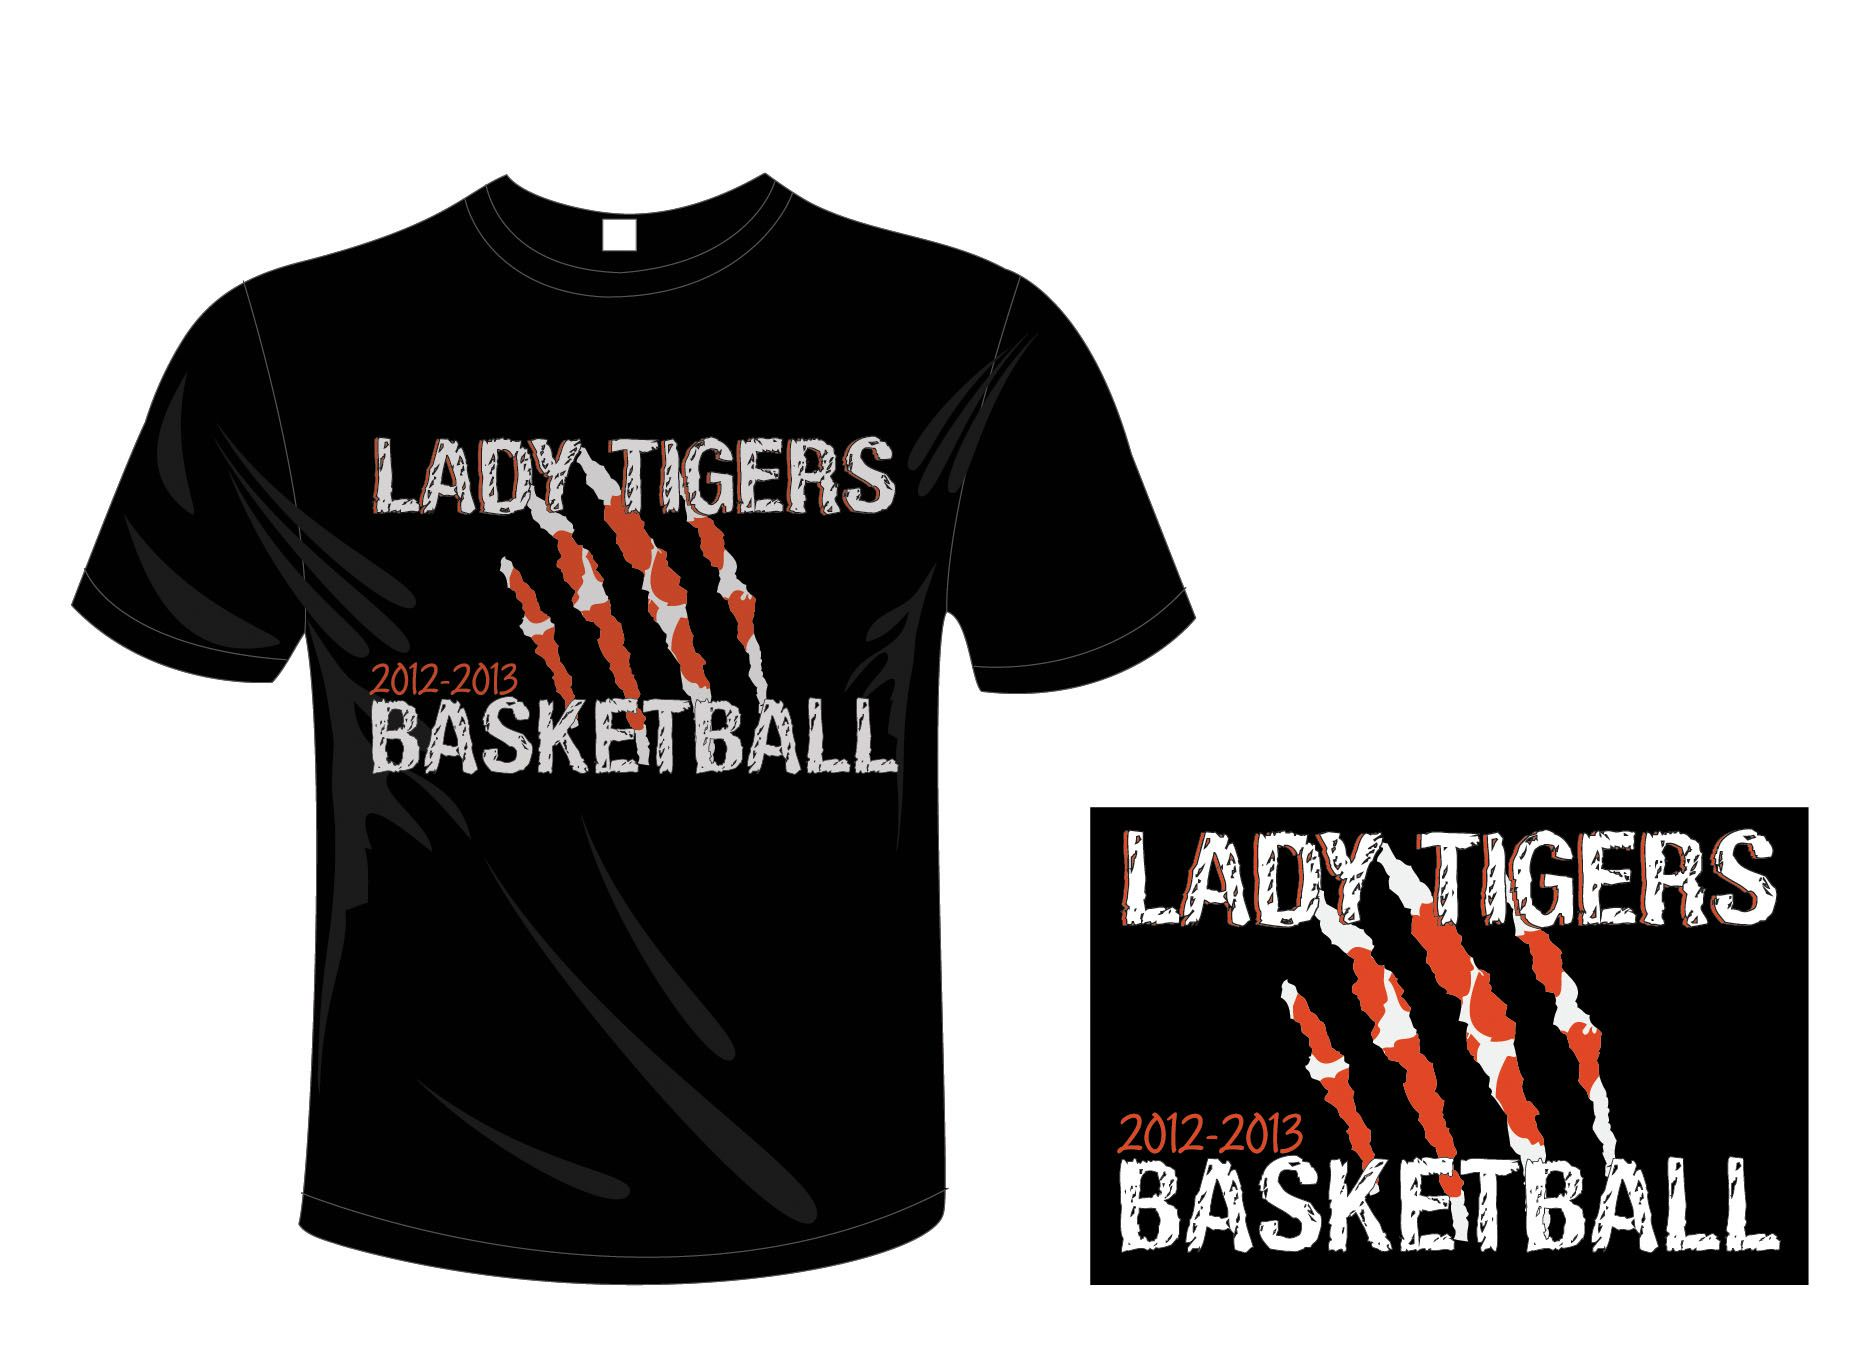 high school basketball shirt designs - Google Search | basketball ...